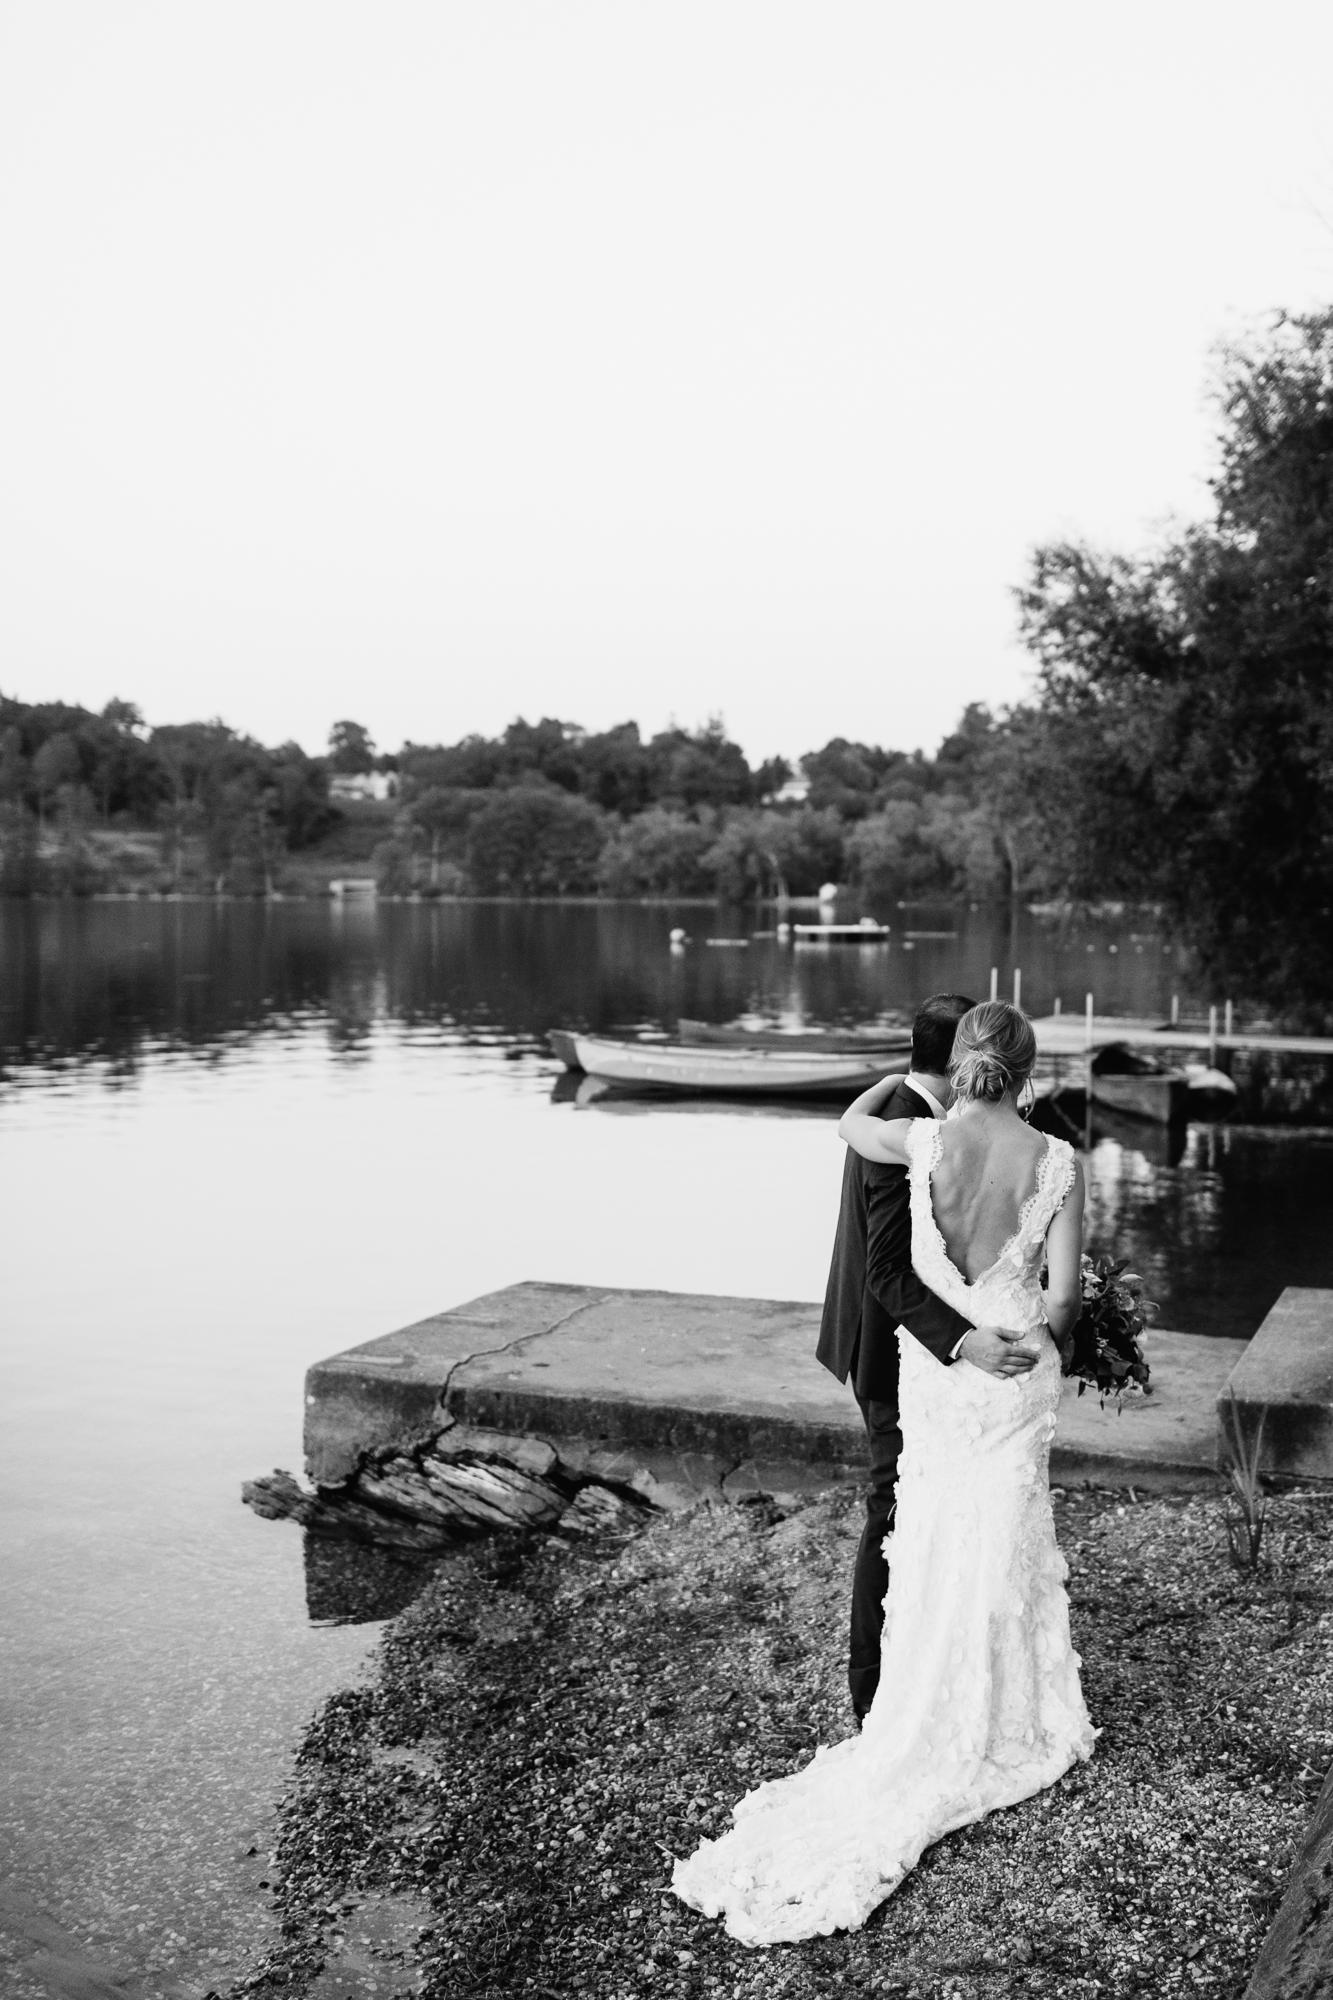 connecticut-summer-lake-wedding-emily-kirke-photography-upstyle (155 of 181).jpg